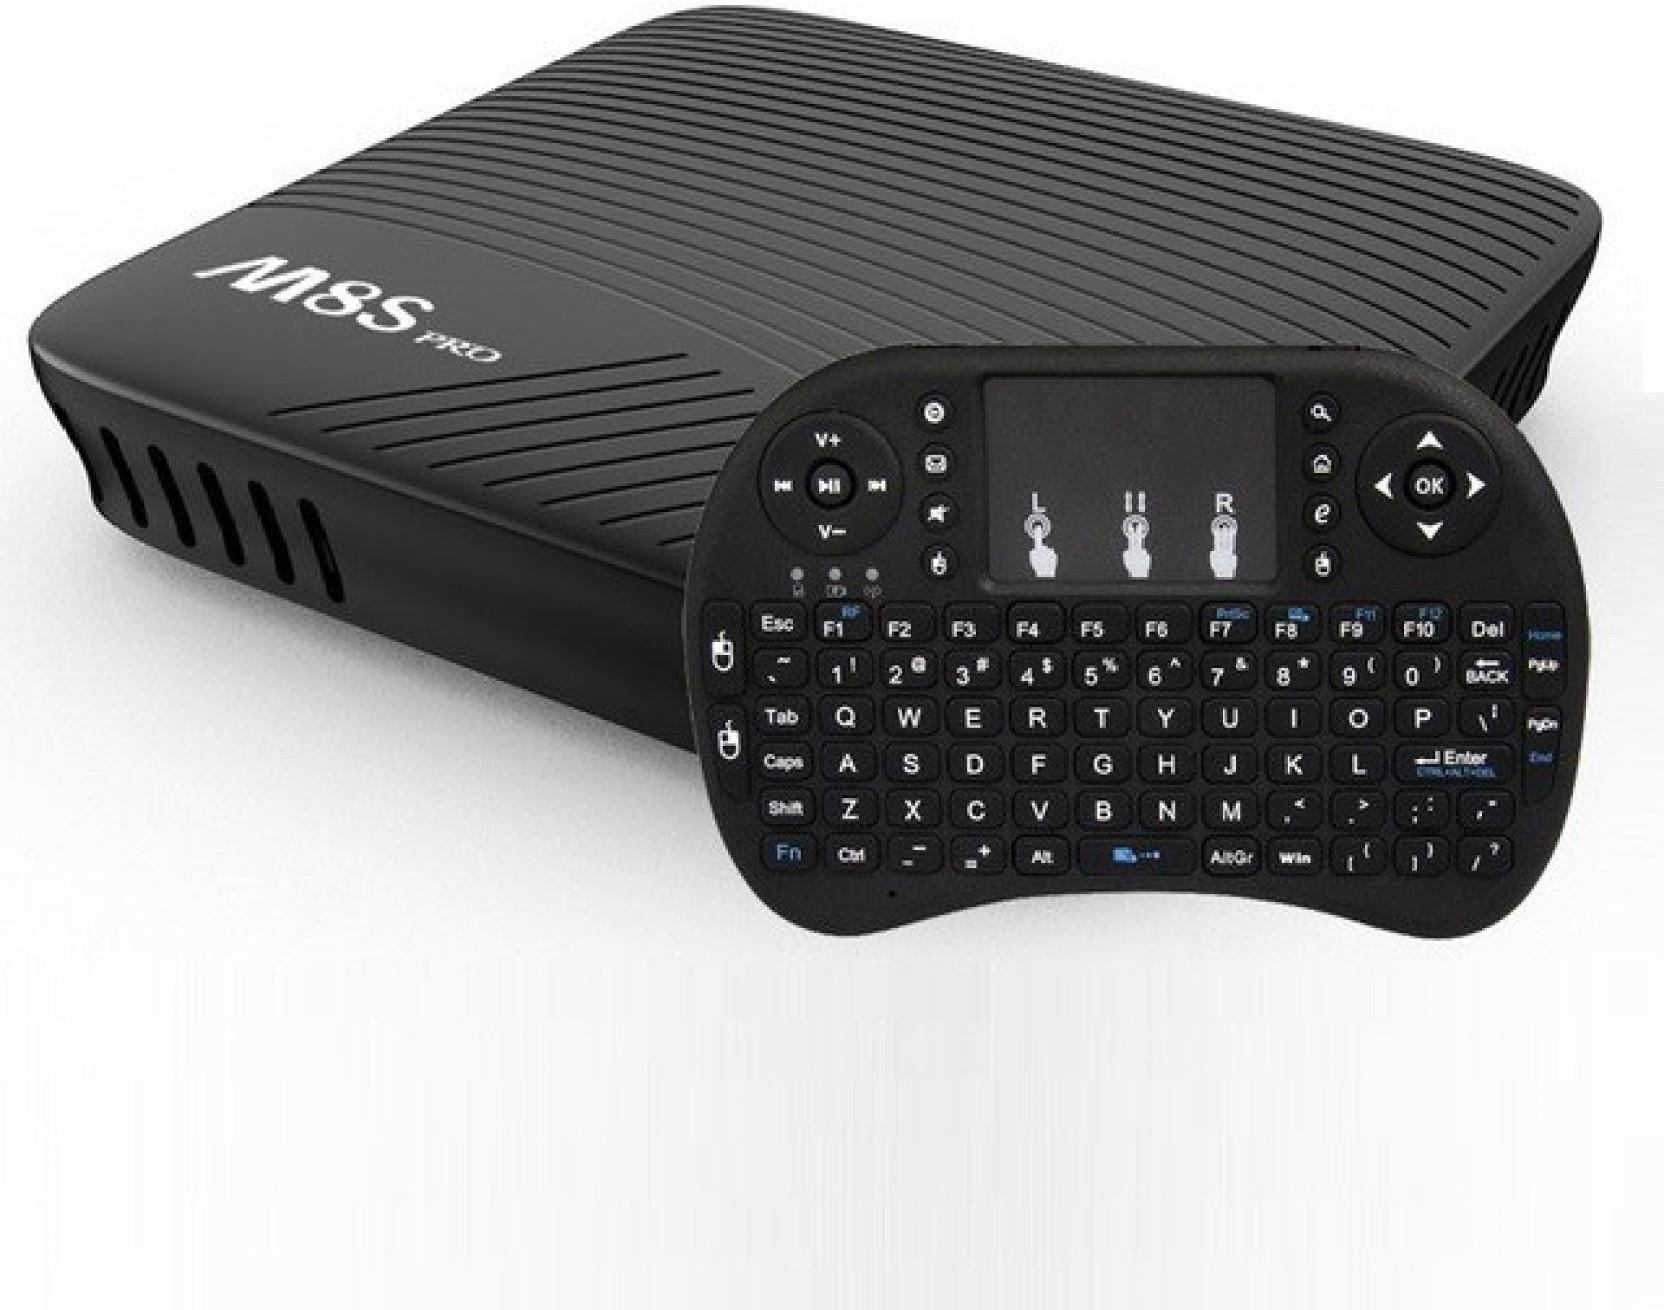 MECOOL M8S PRO W S905W Smart TV Box Quad Core Android 7.1 WIFI 4K 2.4G Keyboard